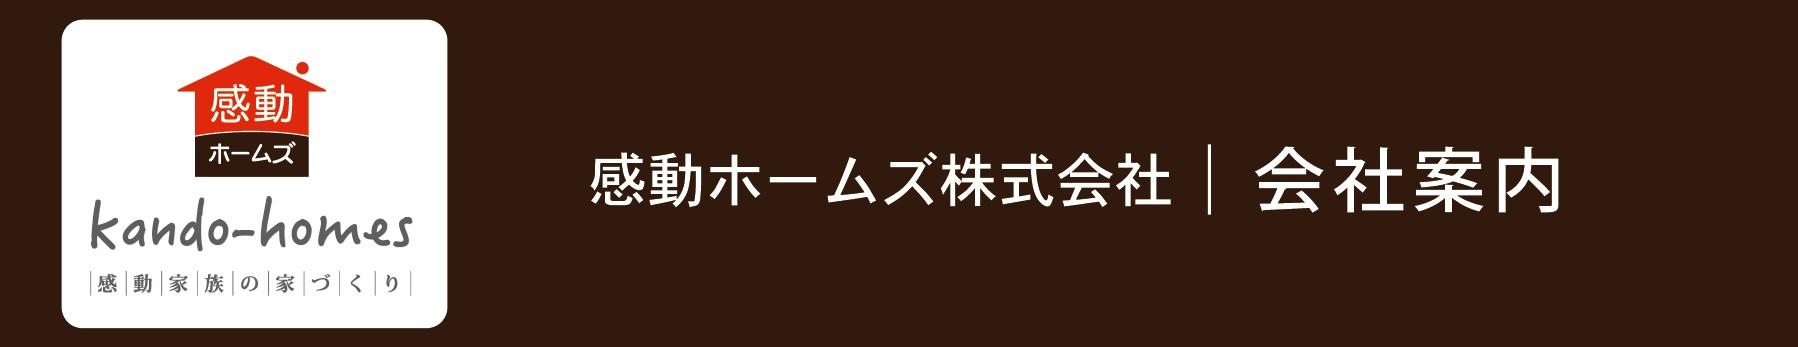 感動ホームズ株式会社┃会社案内